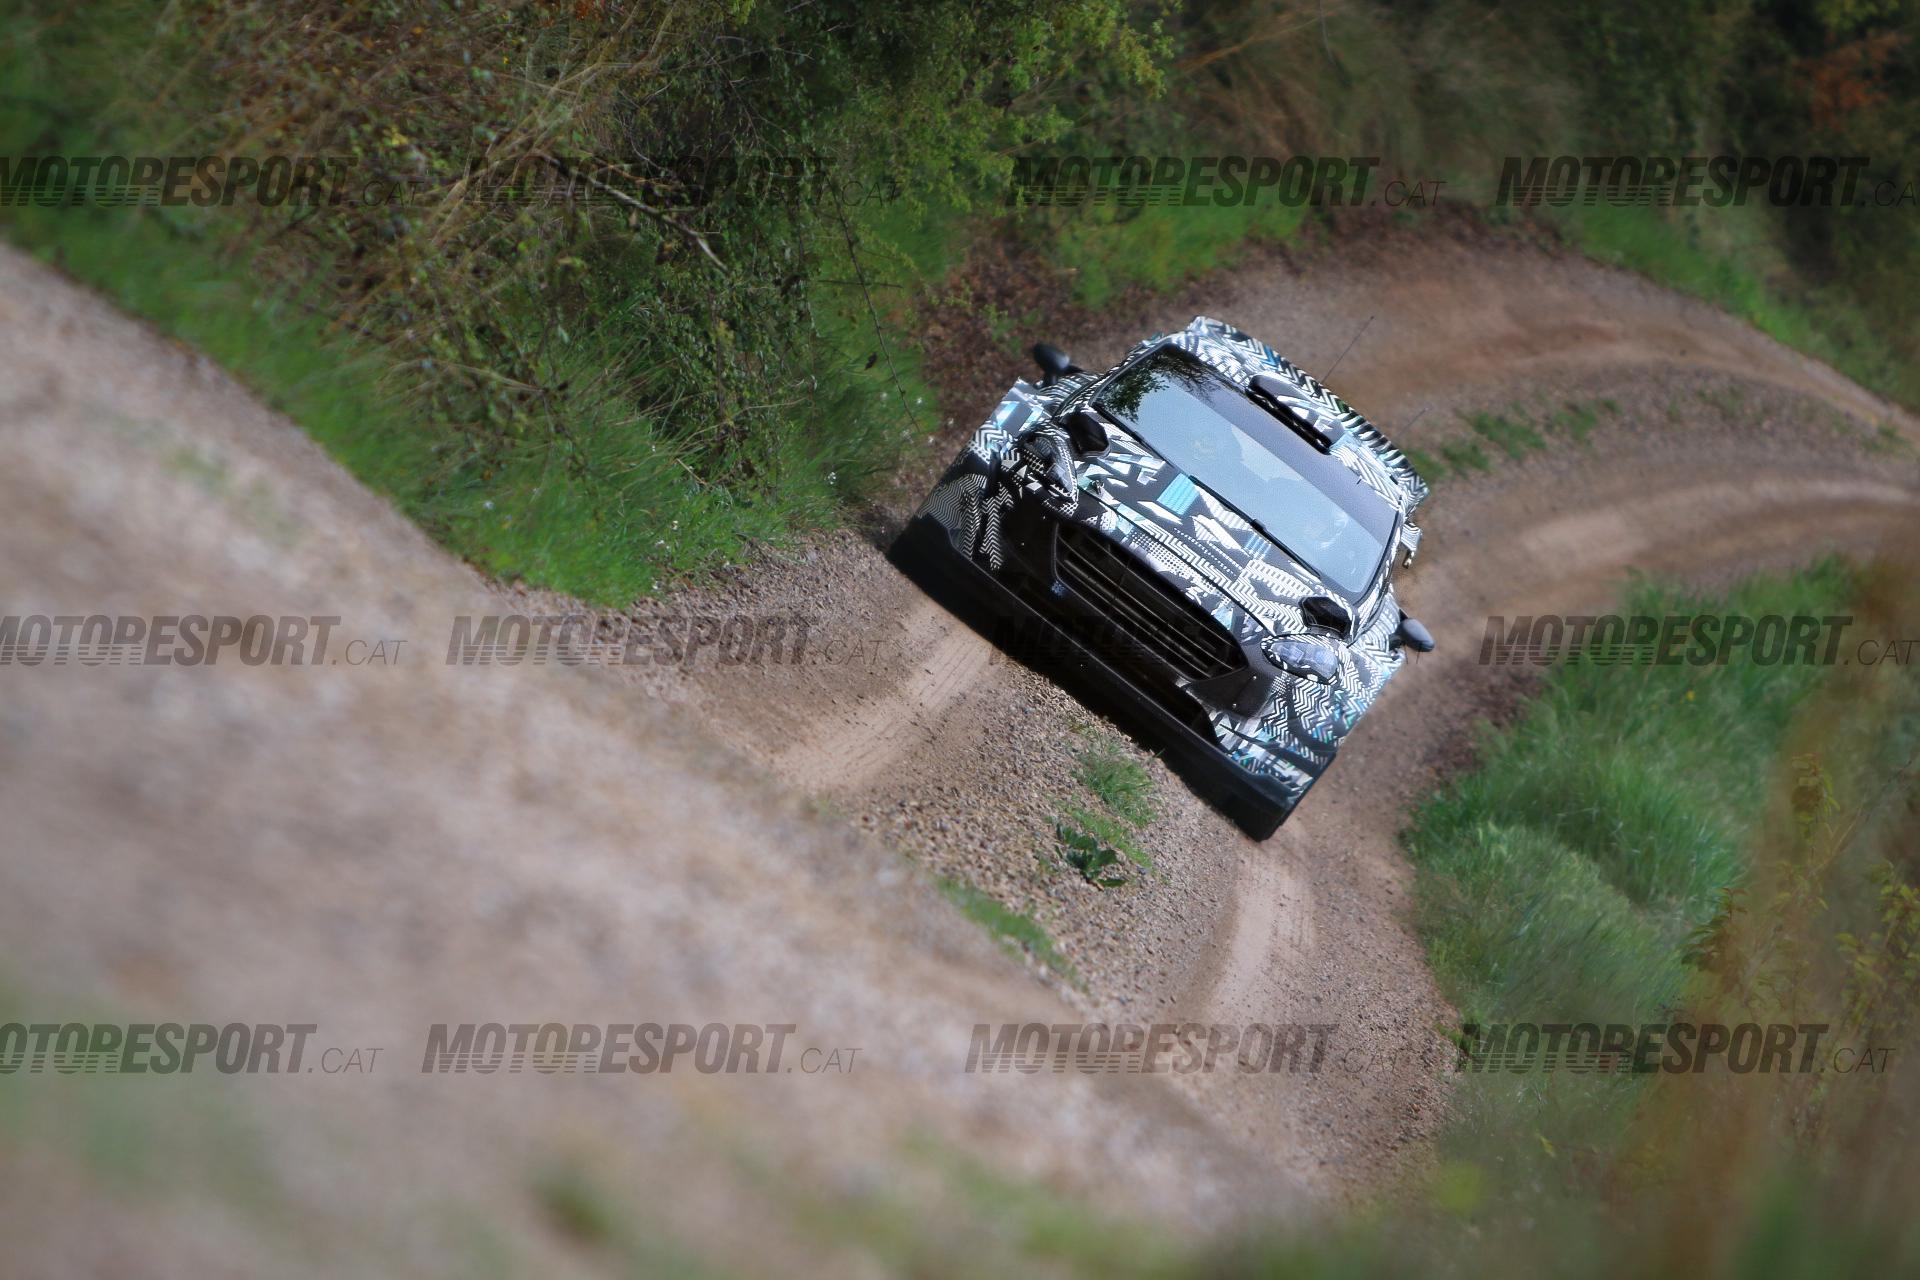 World Rally Championship: Temporada 2021  - Página 23 Ez-G01sXEAMcmzV?format=jpg&name=large